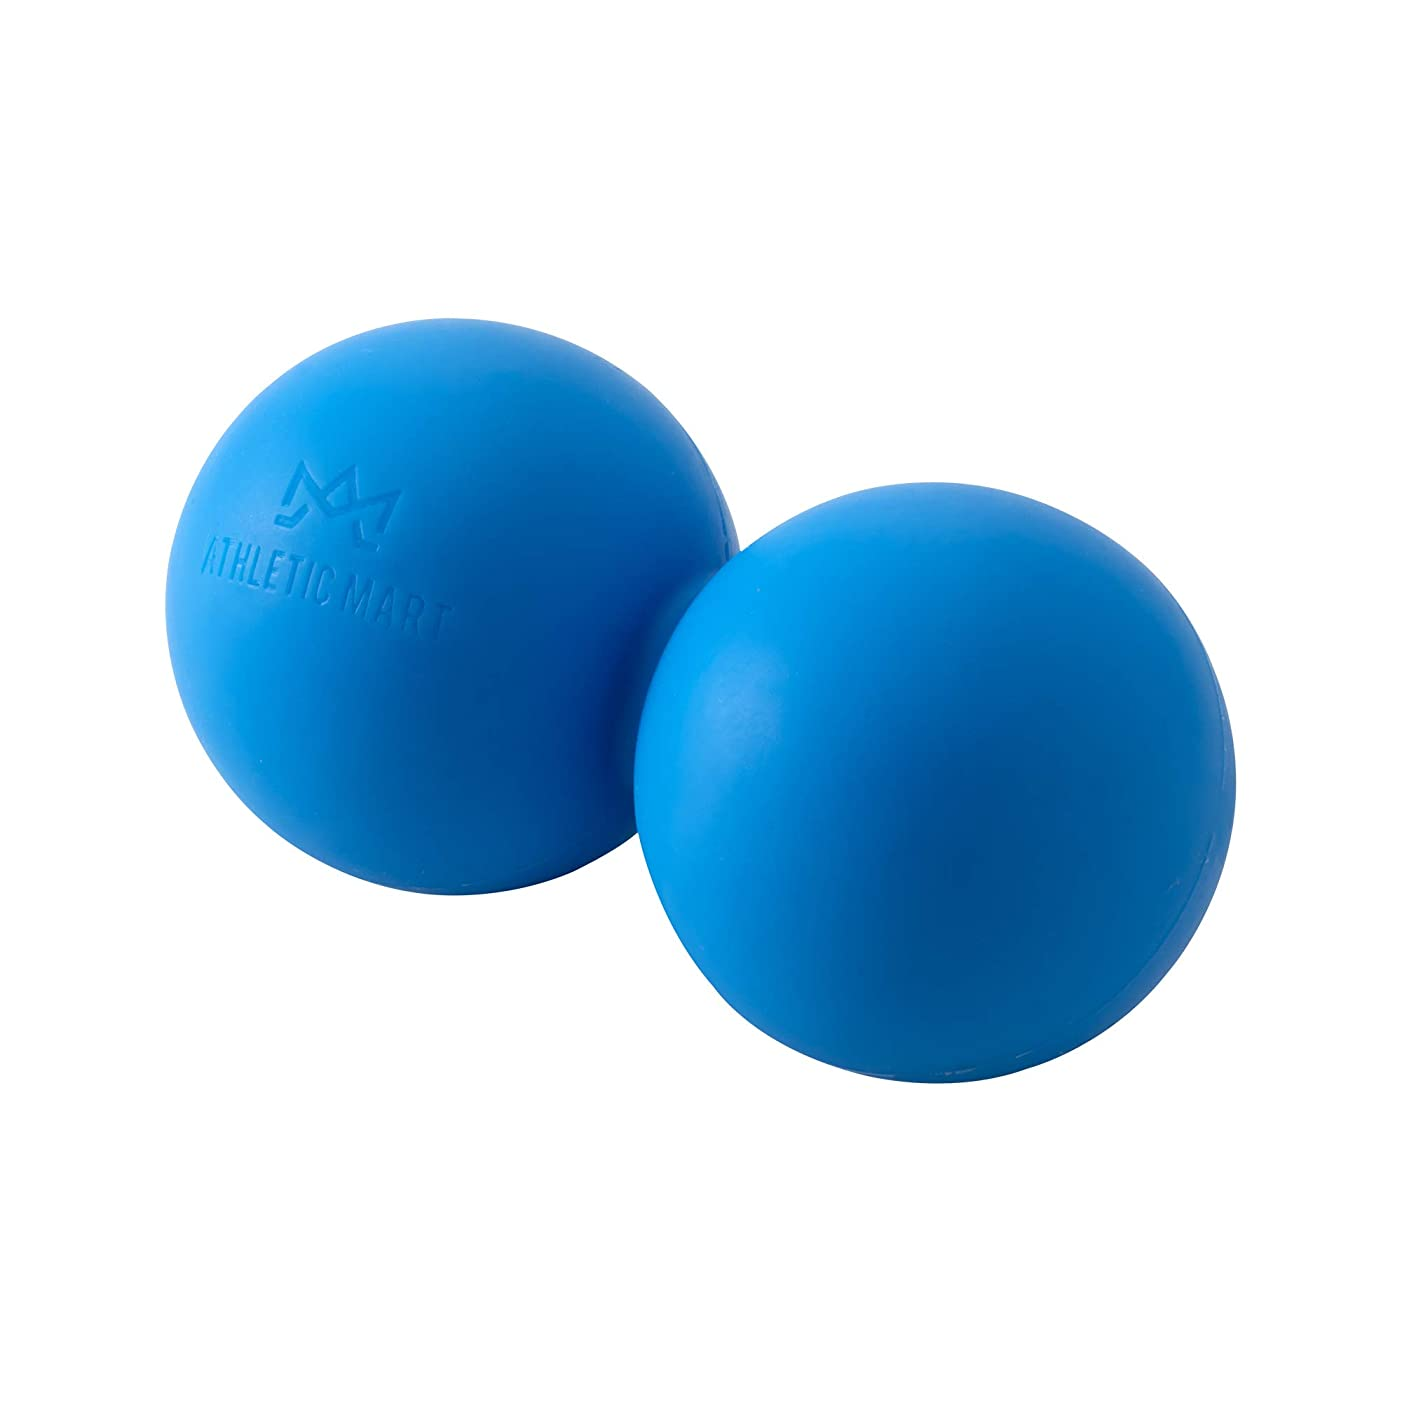 ATHLETIC MART ピーナッツ型ストレッチボール マッサージボール ラクロスボール2個サイズ ツボ押し (ブルー)